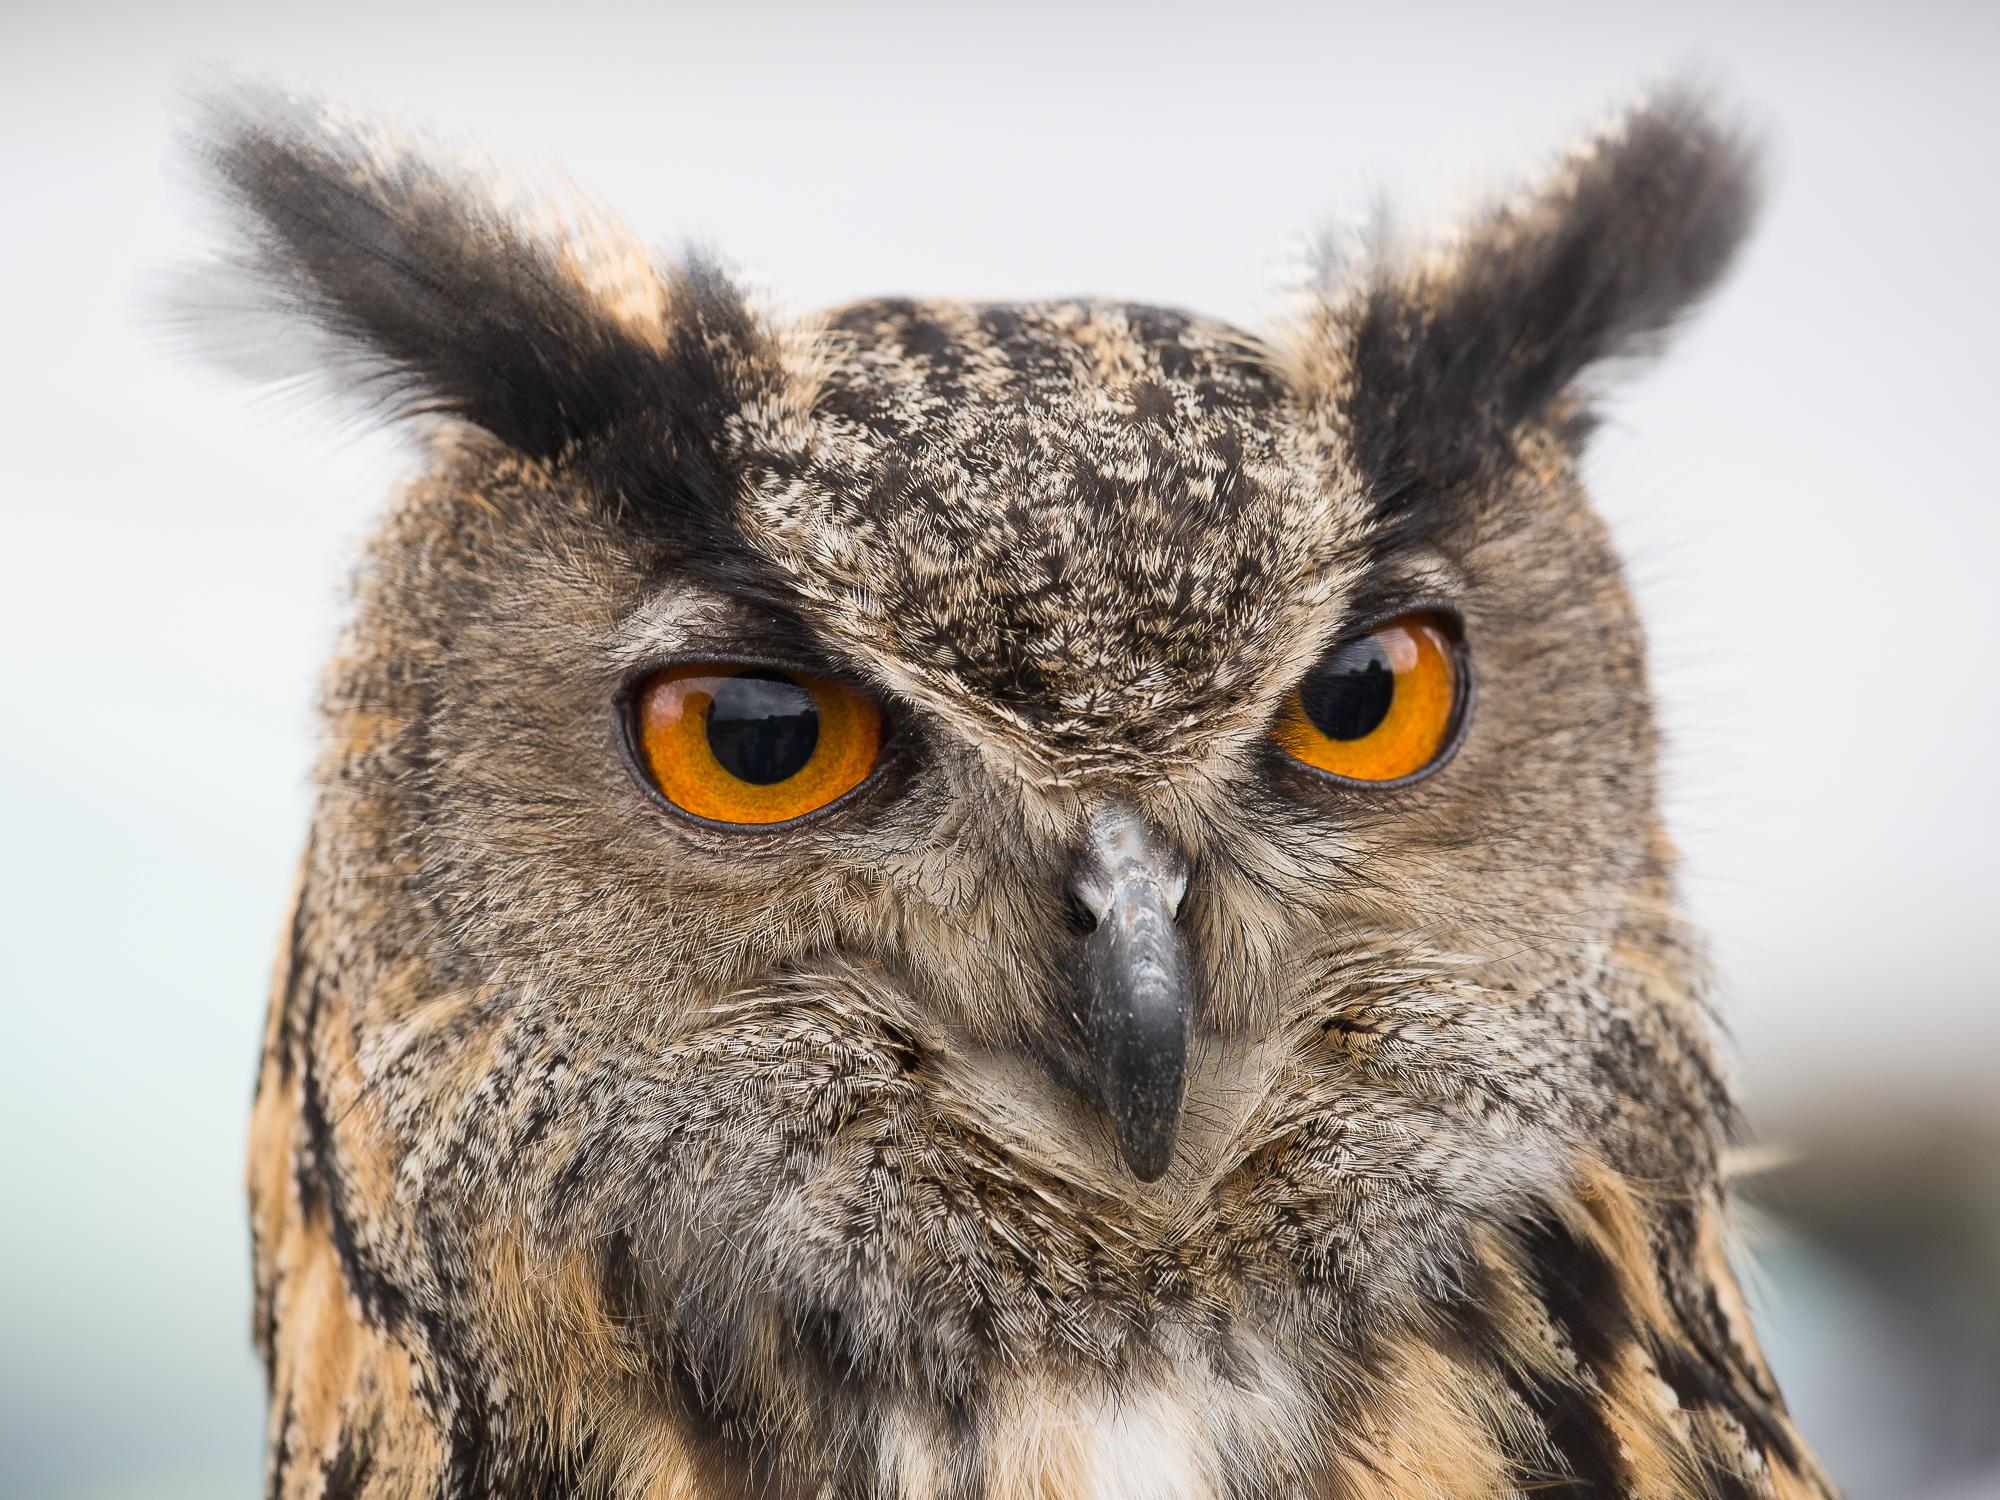 An Eagle Owl up close